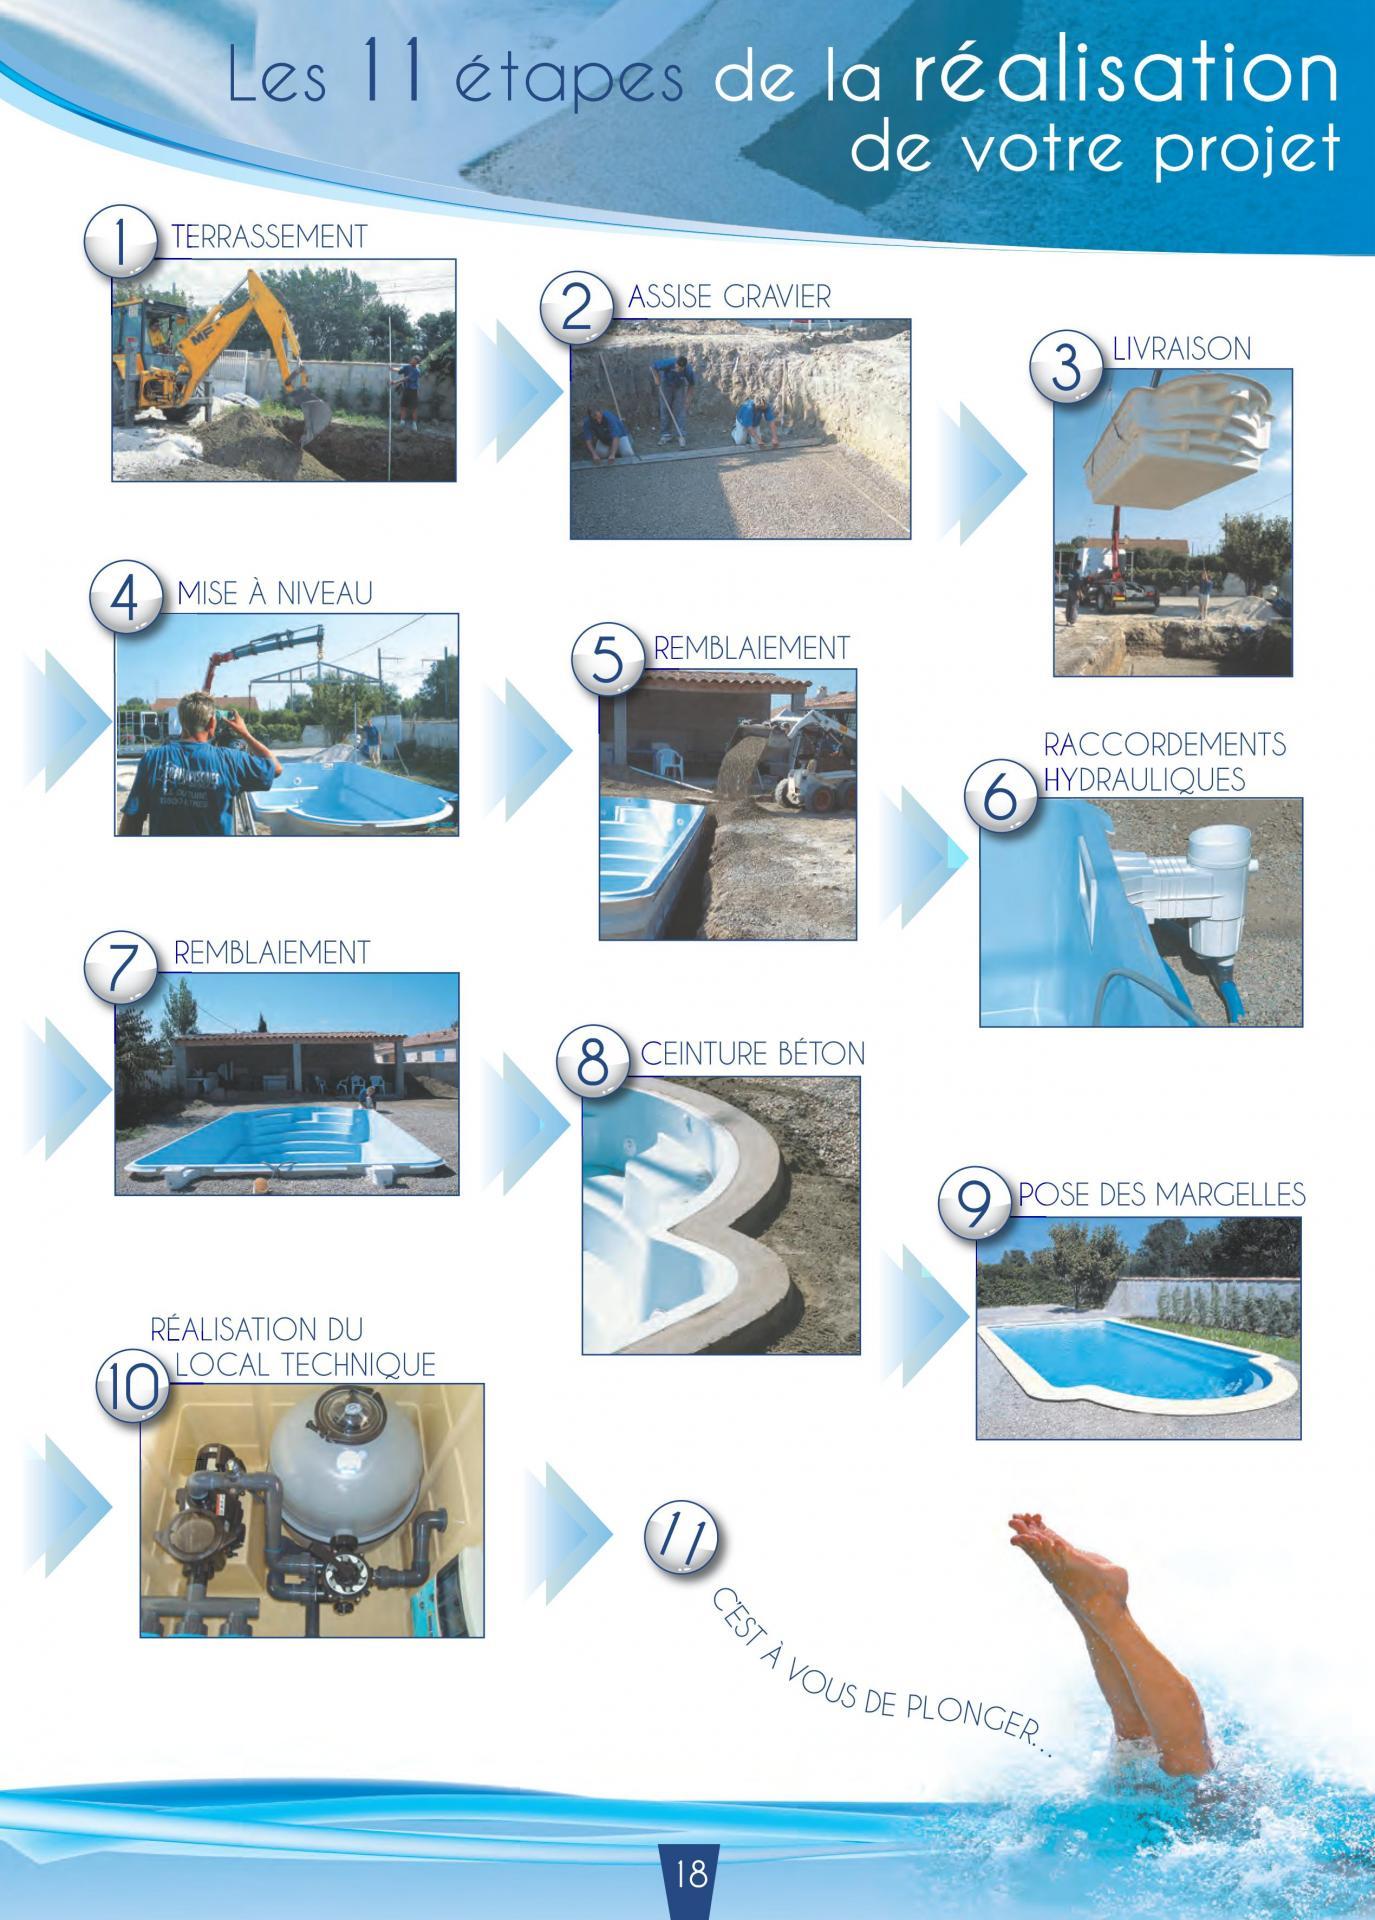 Piscine composite haut de gamme for Plaquette piscine